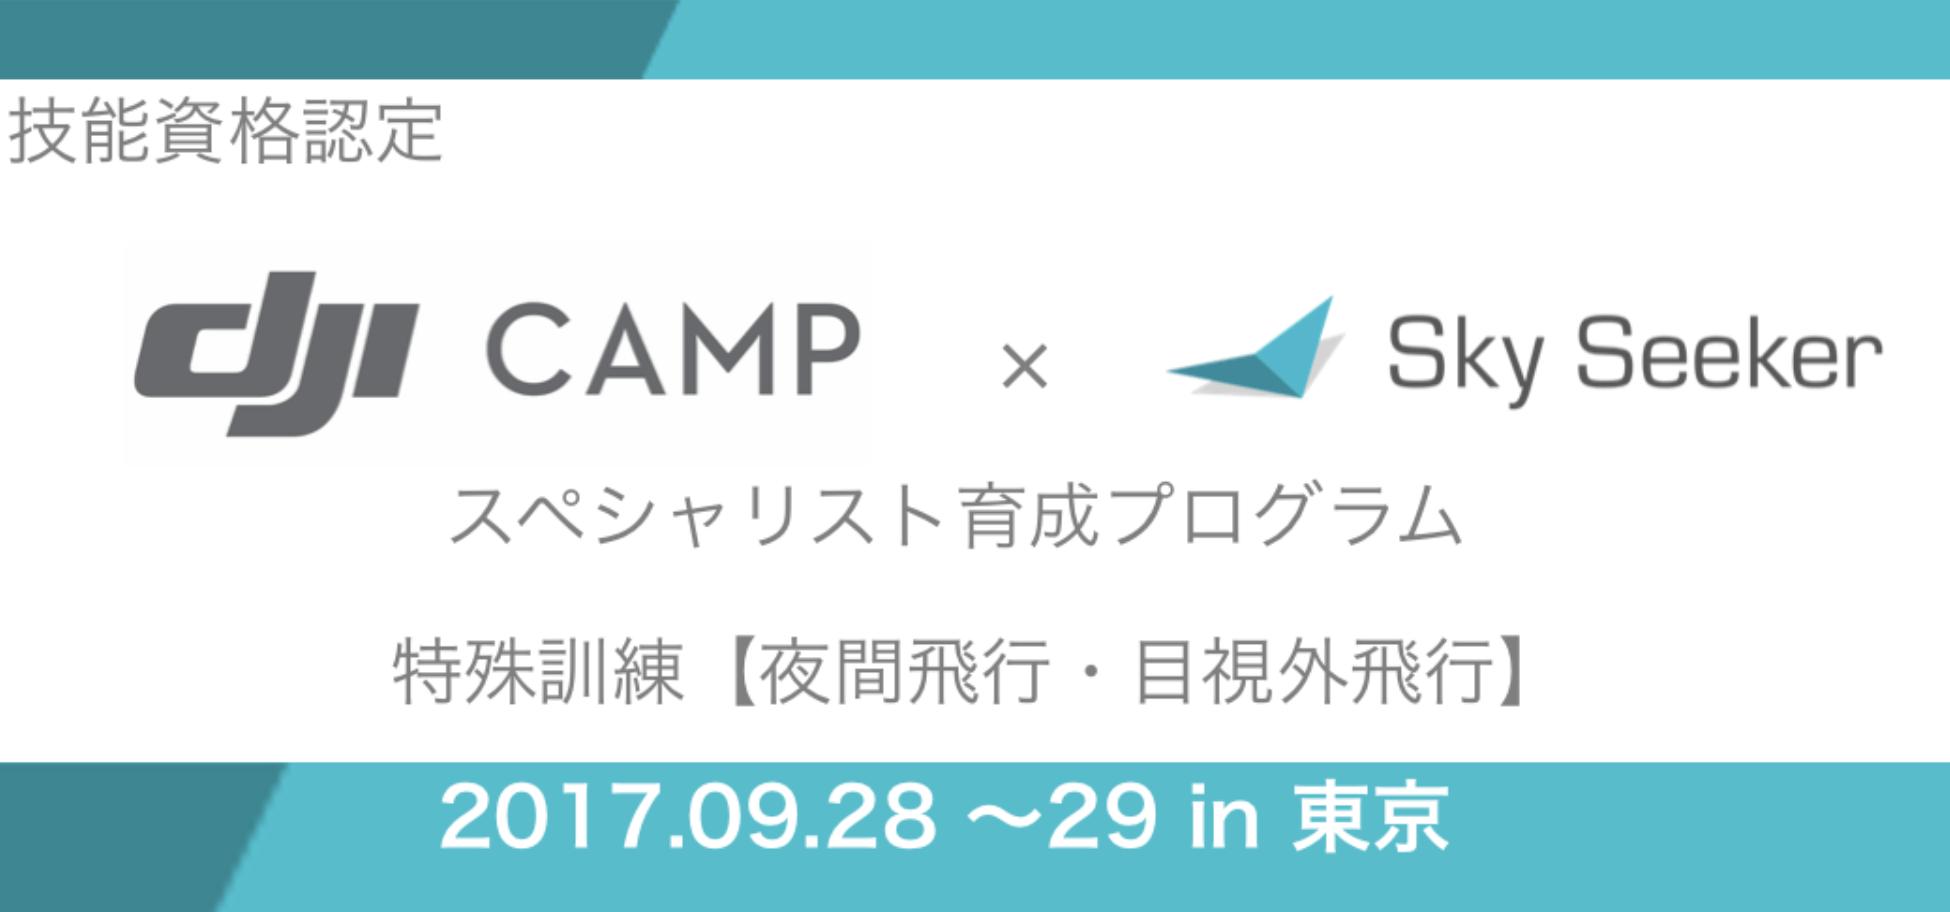 DJI CAMP 情報